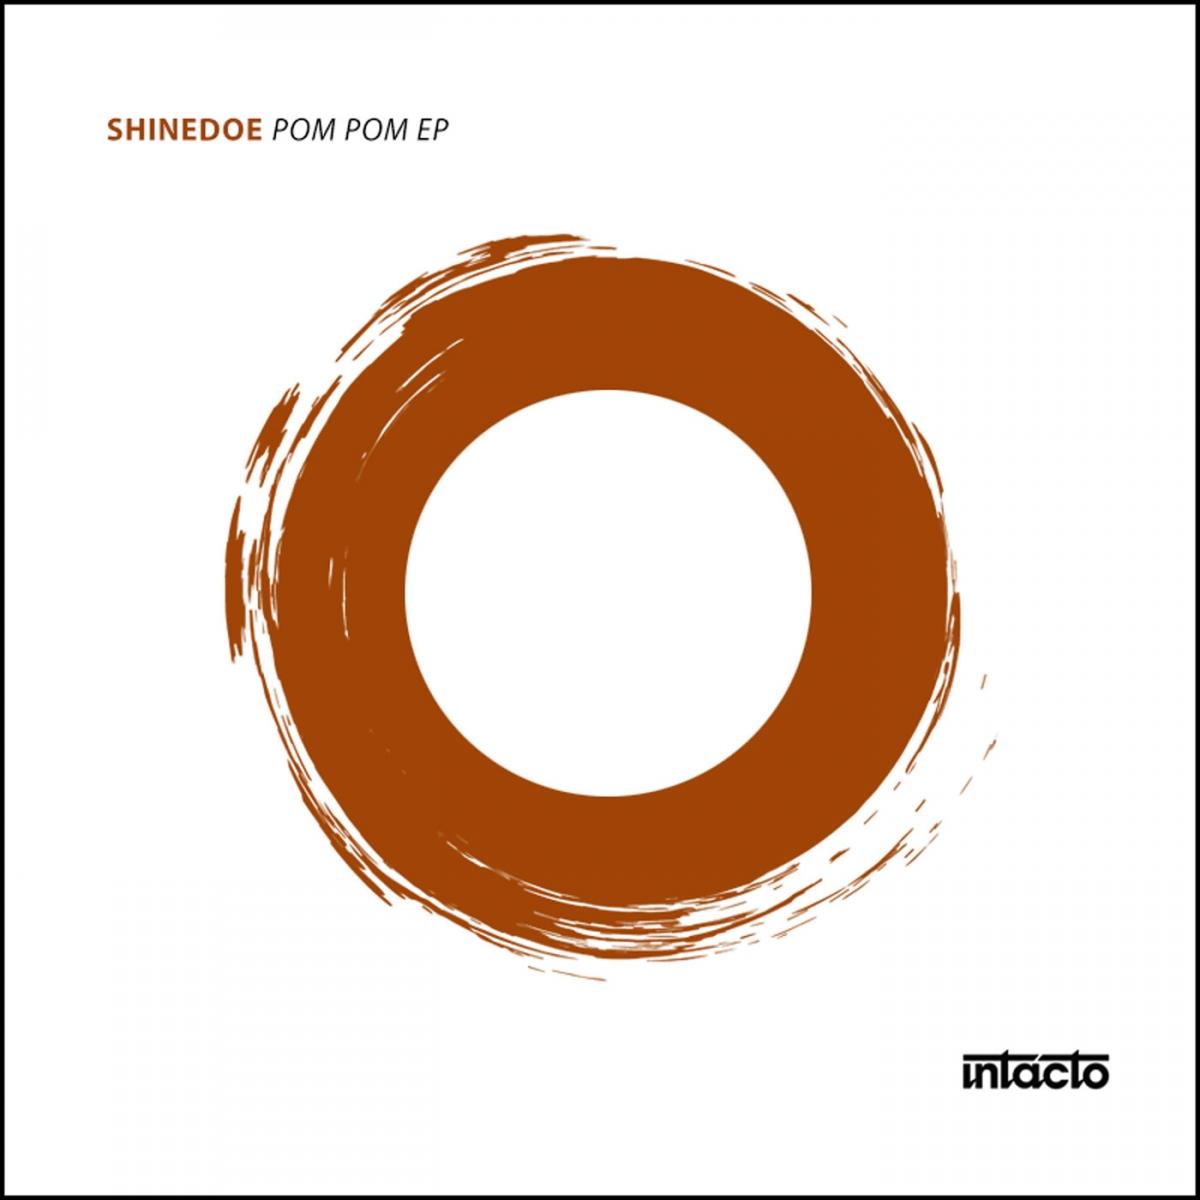 Shinedoe – Pom Pom EP (Intacto 053)